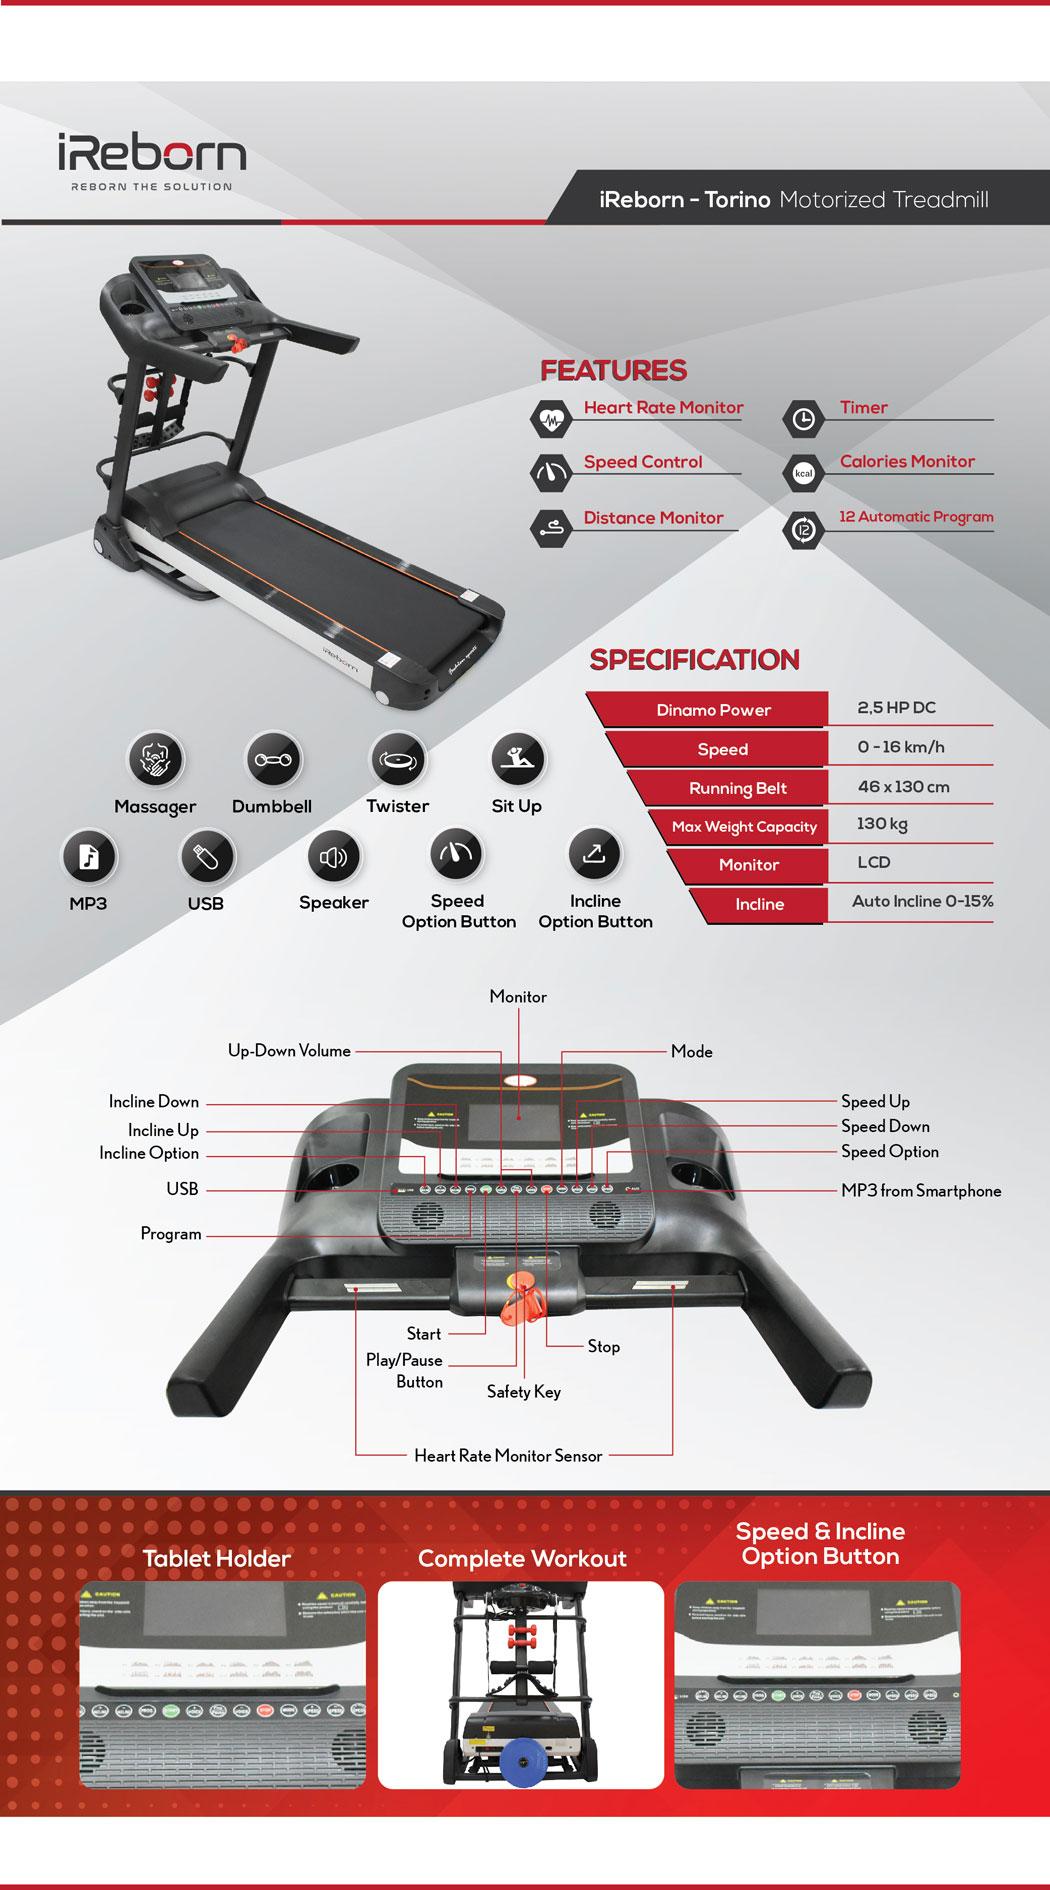 Torino Motorized Treadmill 22